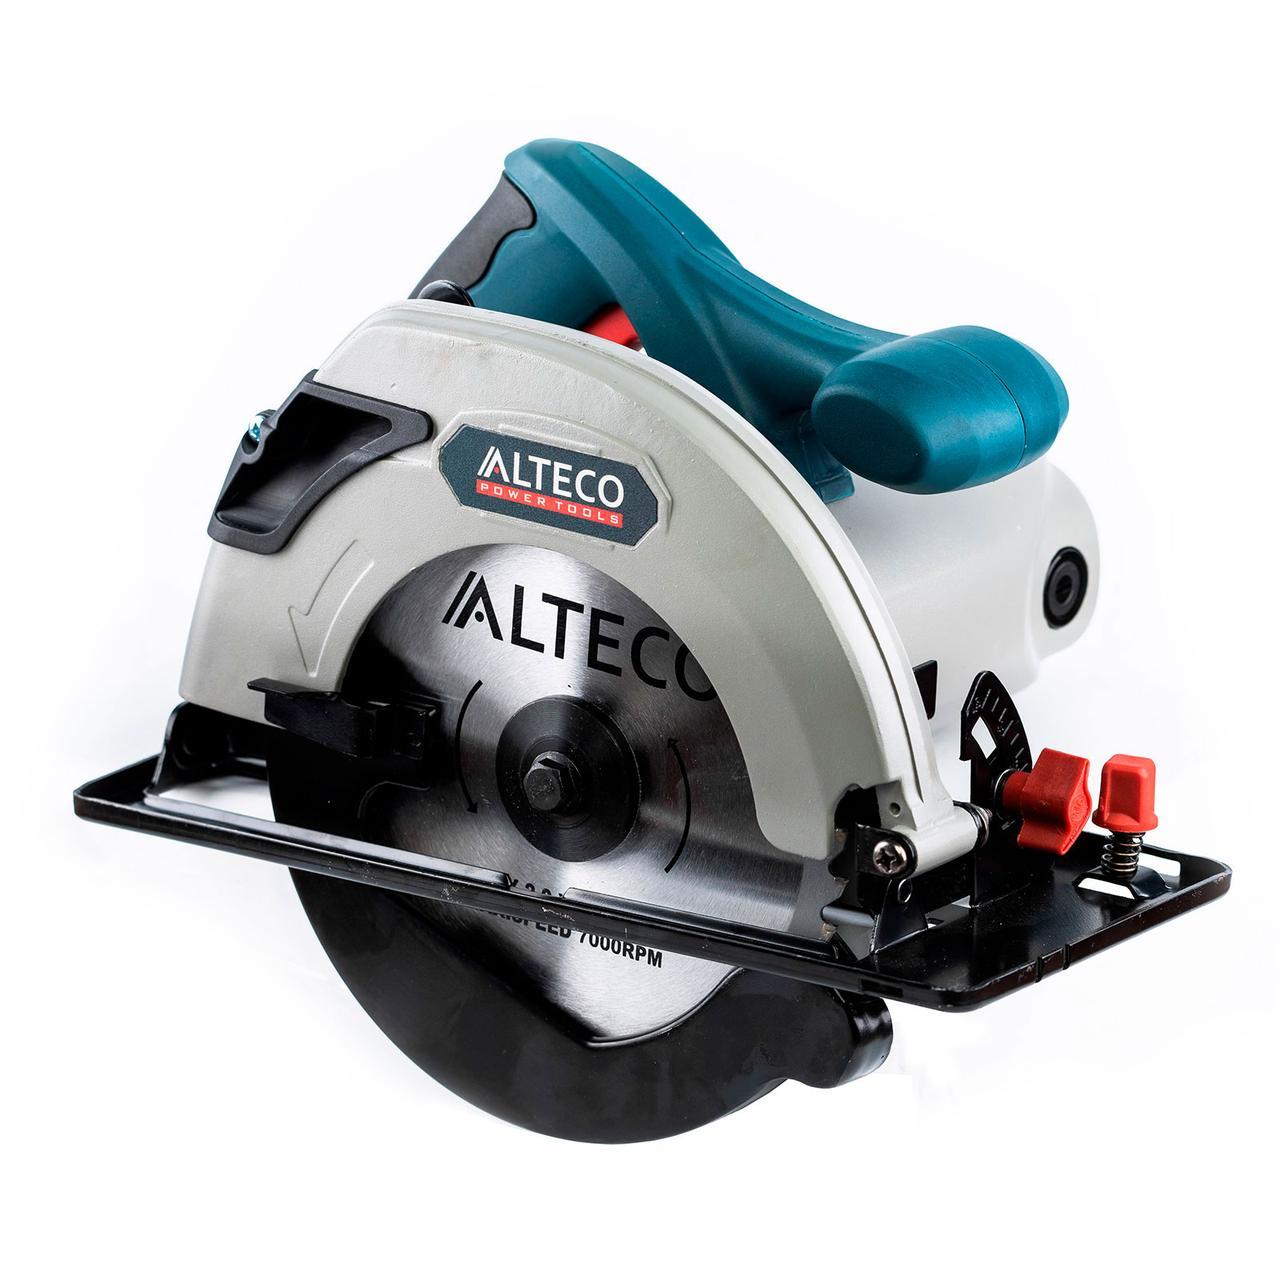 Циркулярная пила ALTECO CS 0510 (CS1400-185) 1300Вт 185х20мм 5000об/мин мах. глуб. пропила-60мм